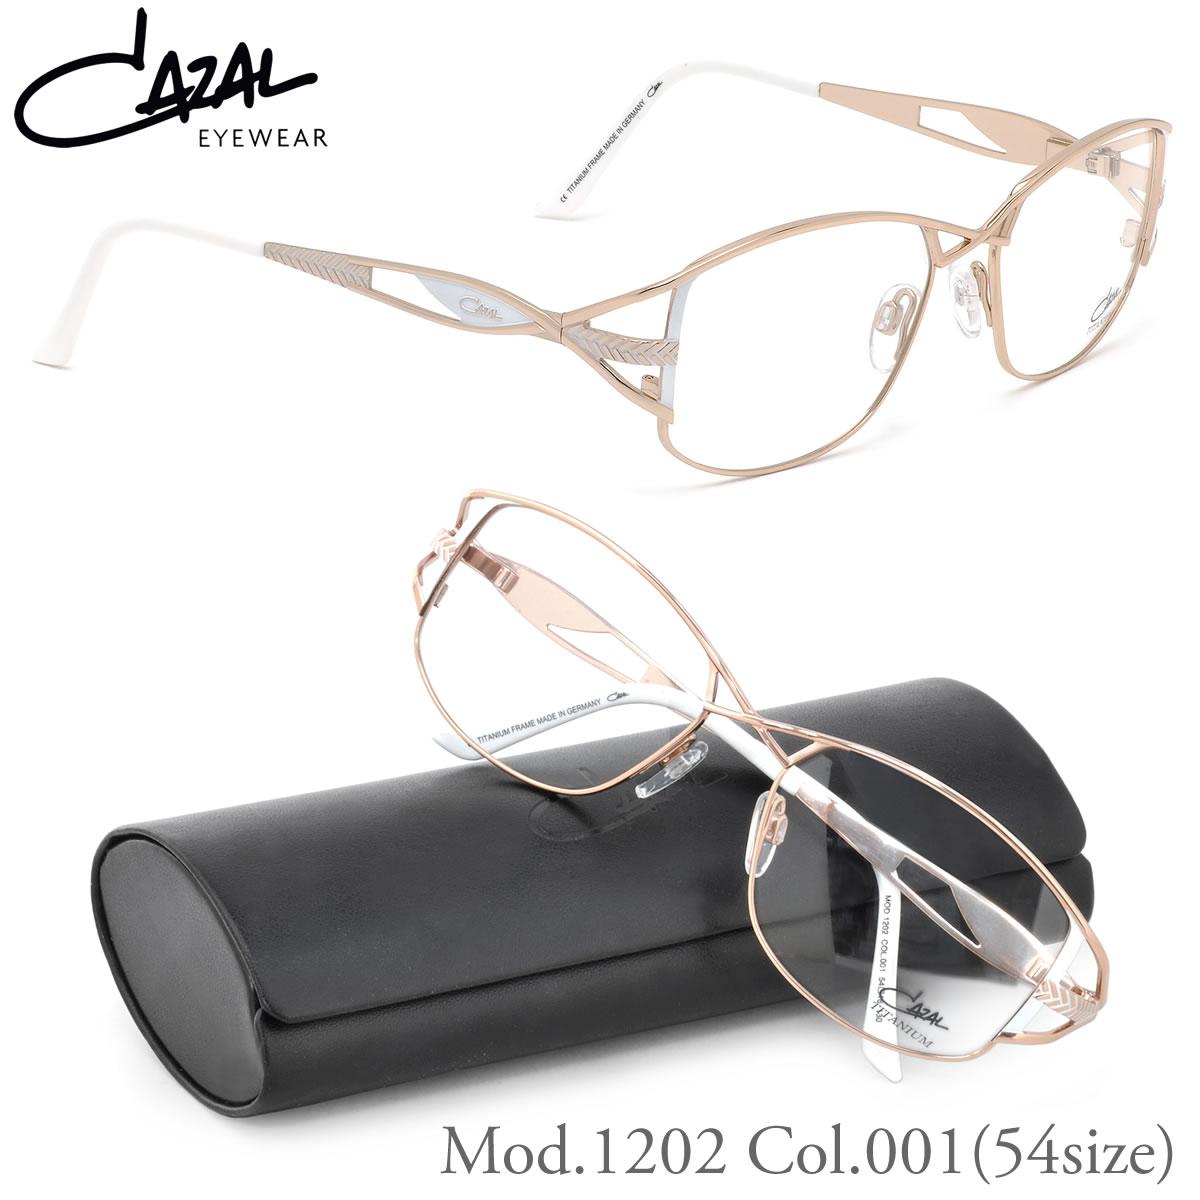 02e7a3a2b81 1202-CAZAL eyeglasses 001 54 size spring hinge spring Ding-square celebrity  CAZAL ITA eyeglass lens free men women